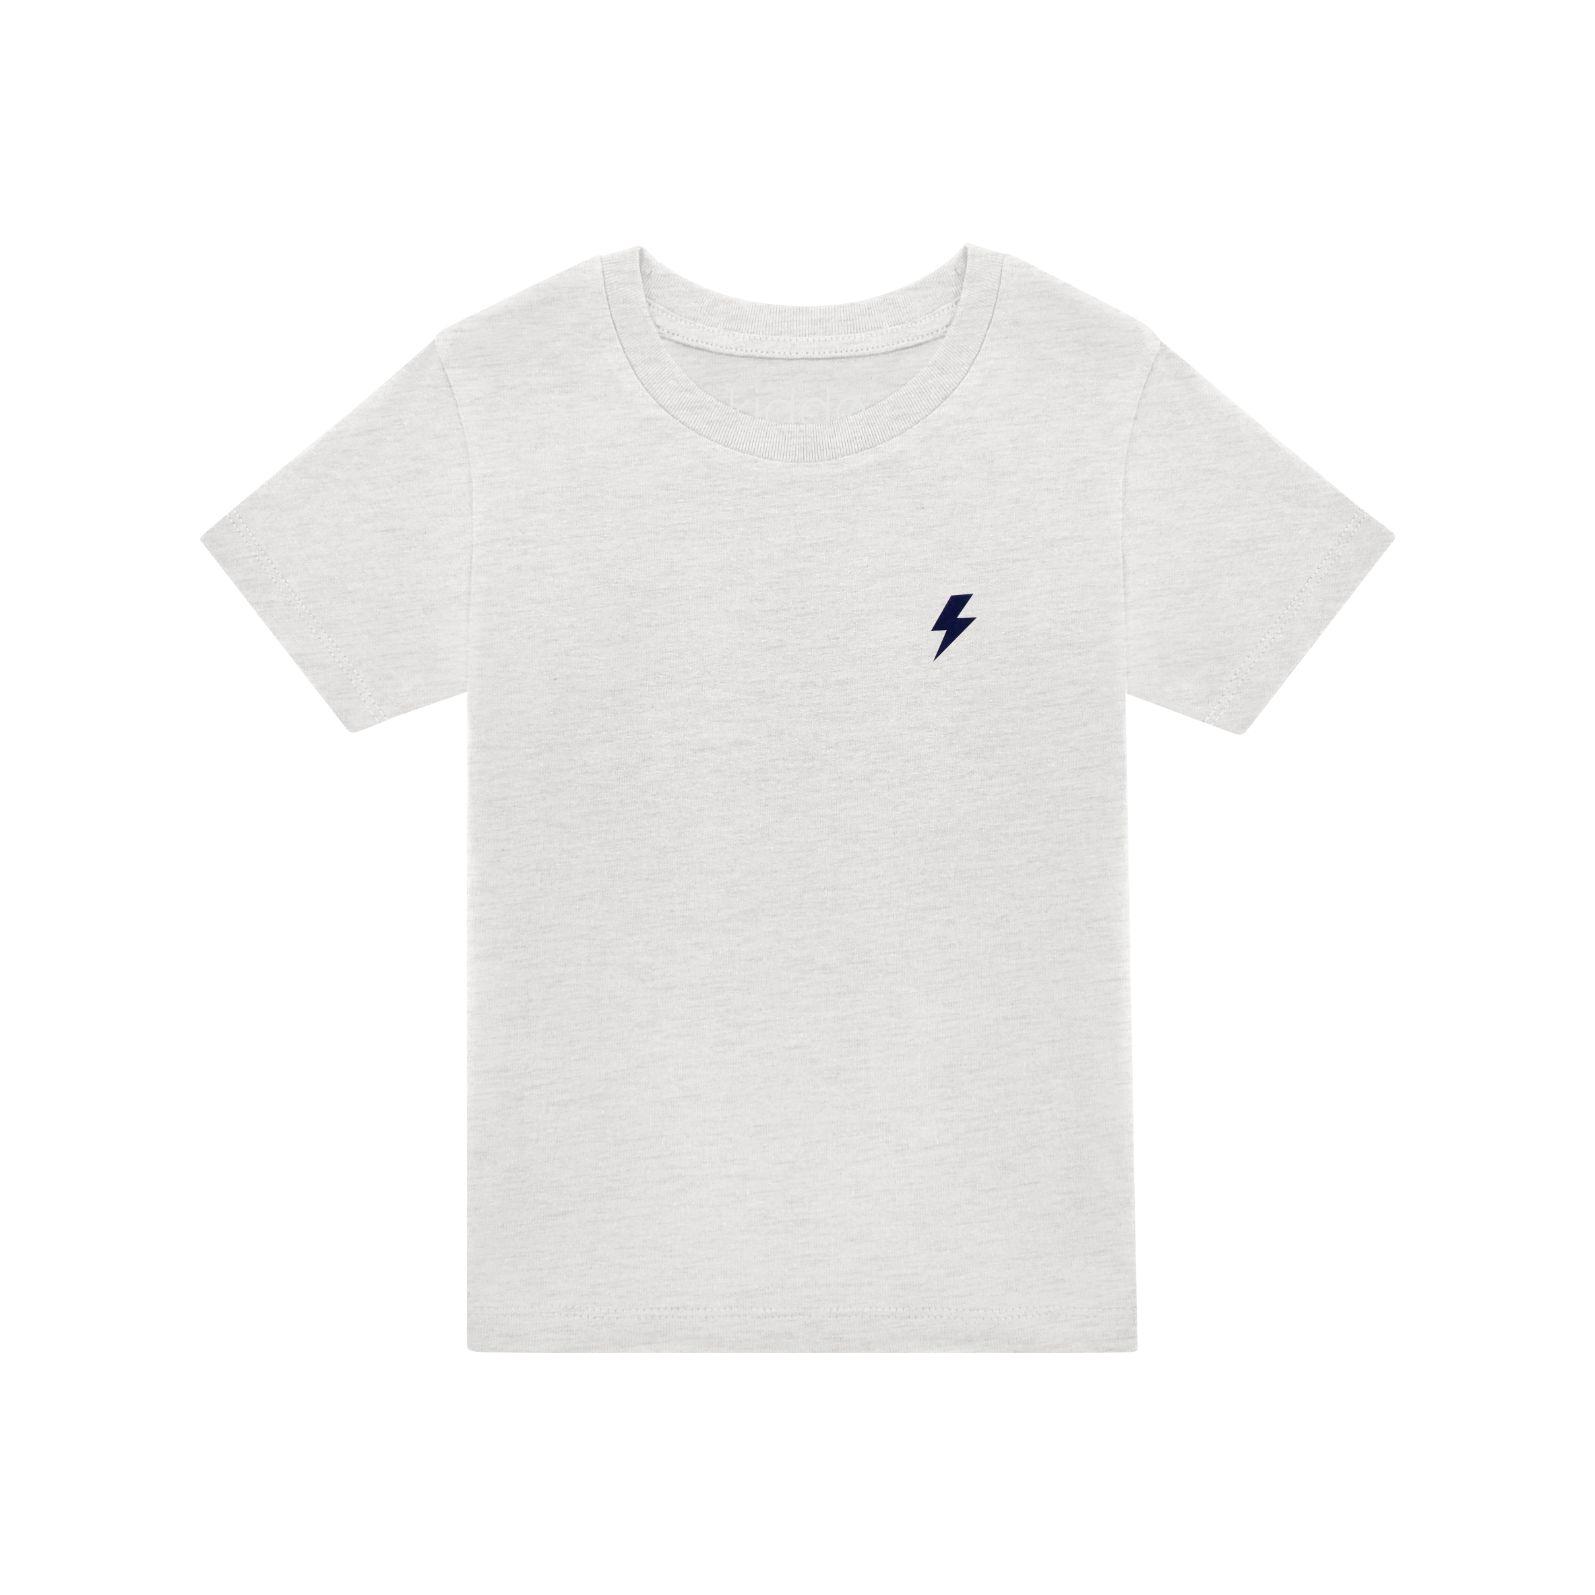 kiddø – Lightning – t-shirt